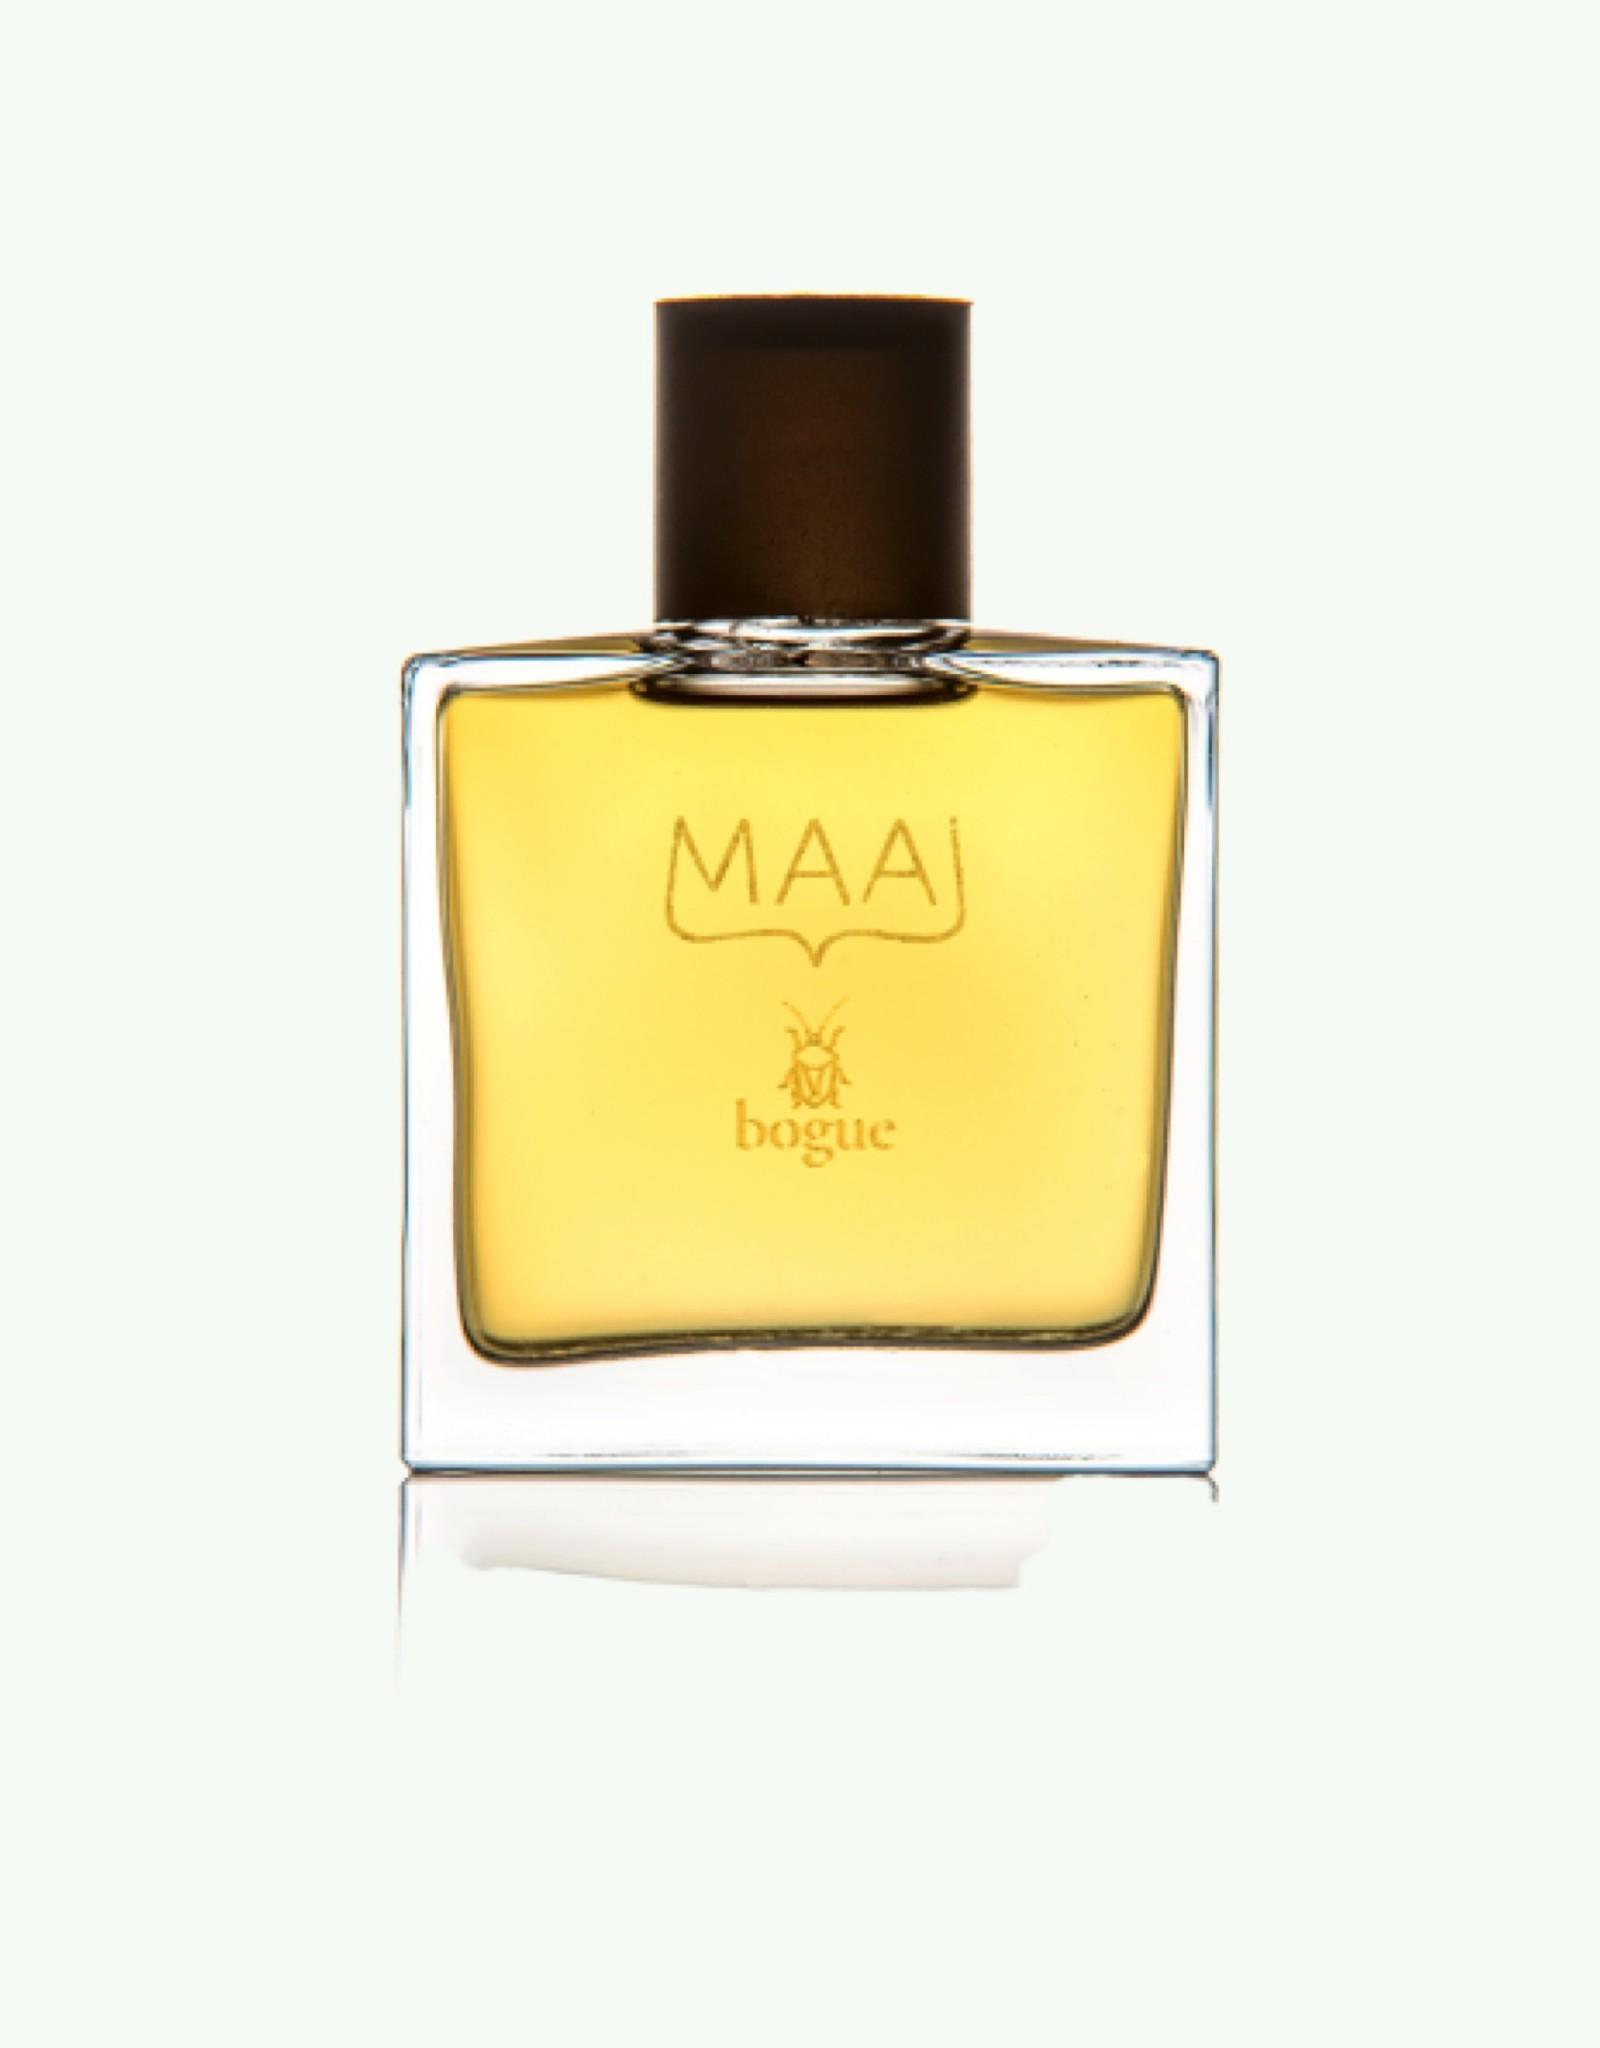 Bogue Profumo Bogue Profumo - MAAI - Extrait de Parfum